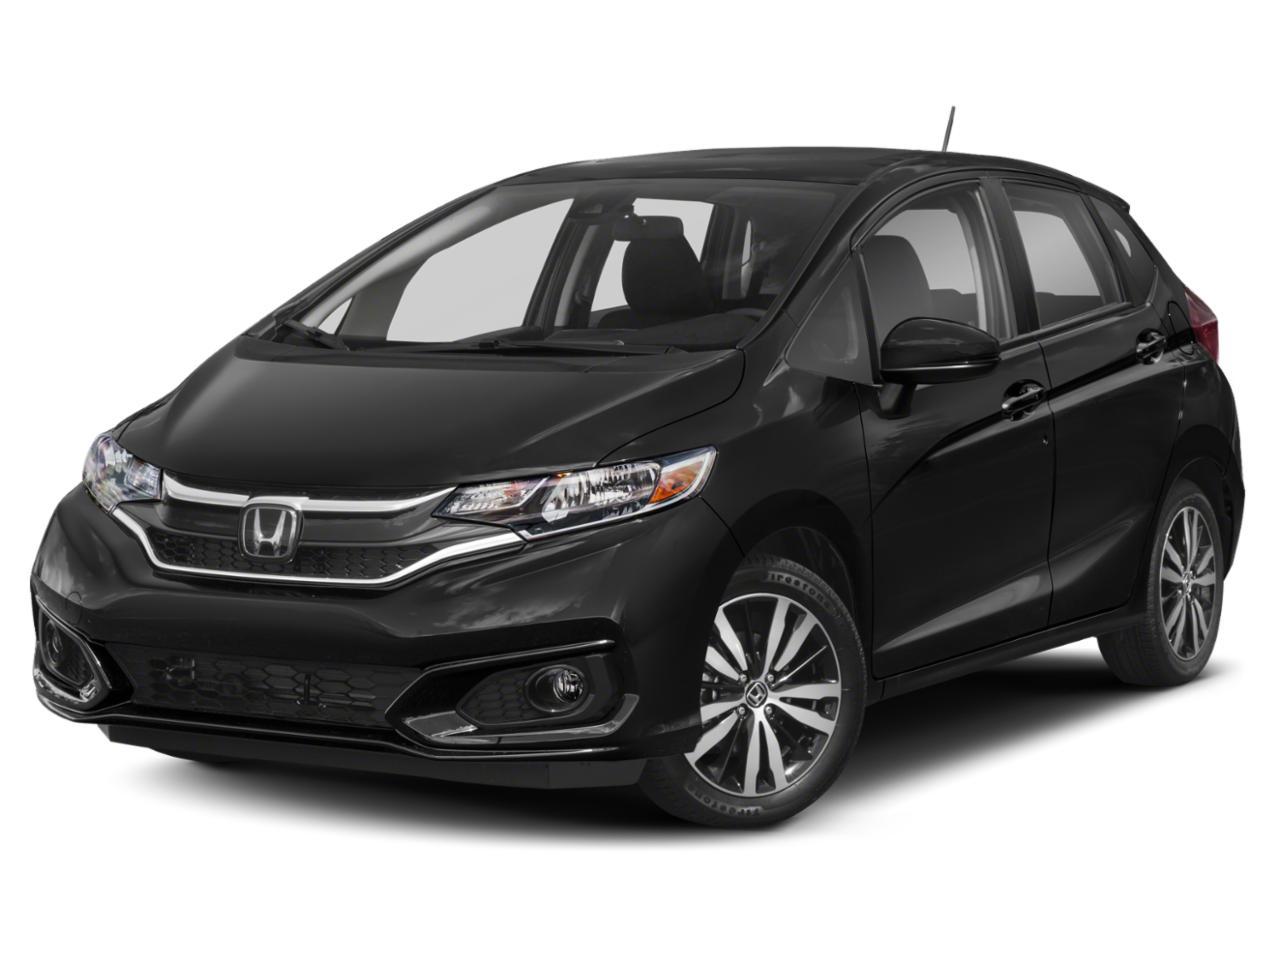 2020 Honda Fit Vehicle Photo in Owensboro, KY 42301